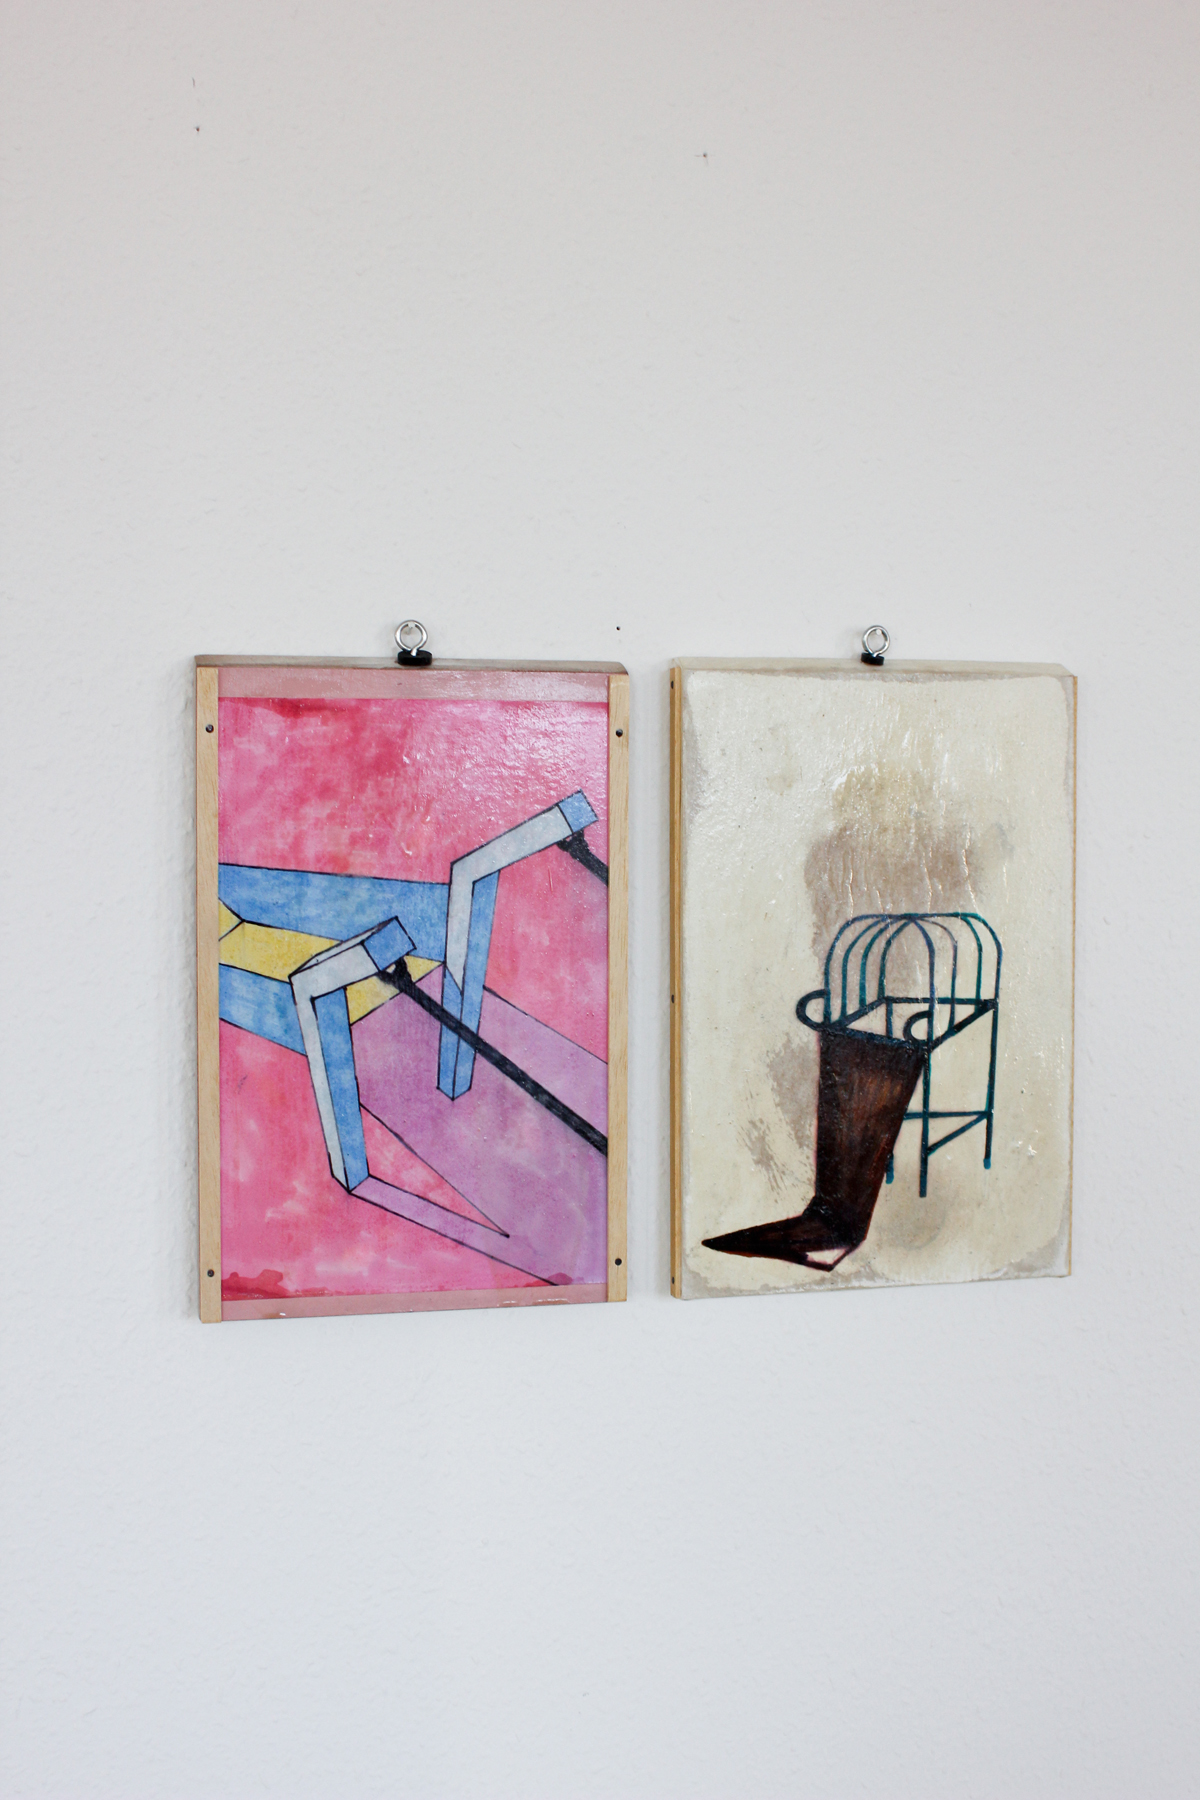 exhibition_view__Studio_LOES_Raiko_Sanchez9